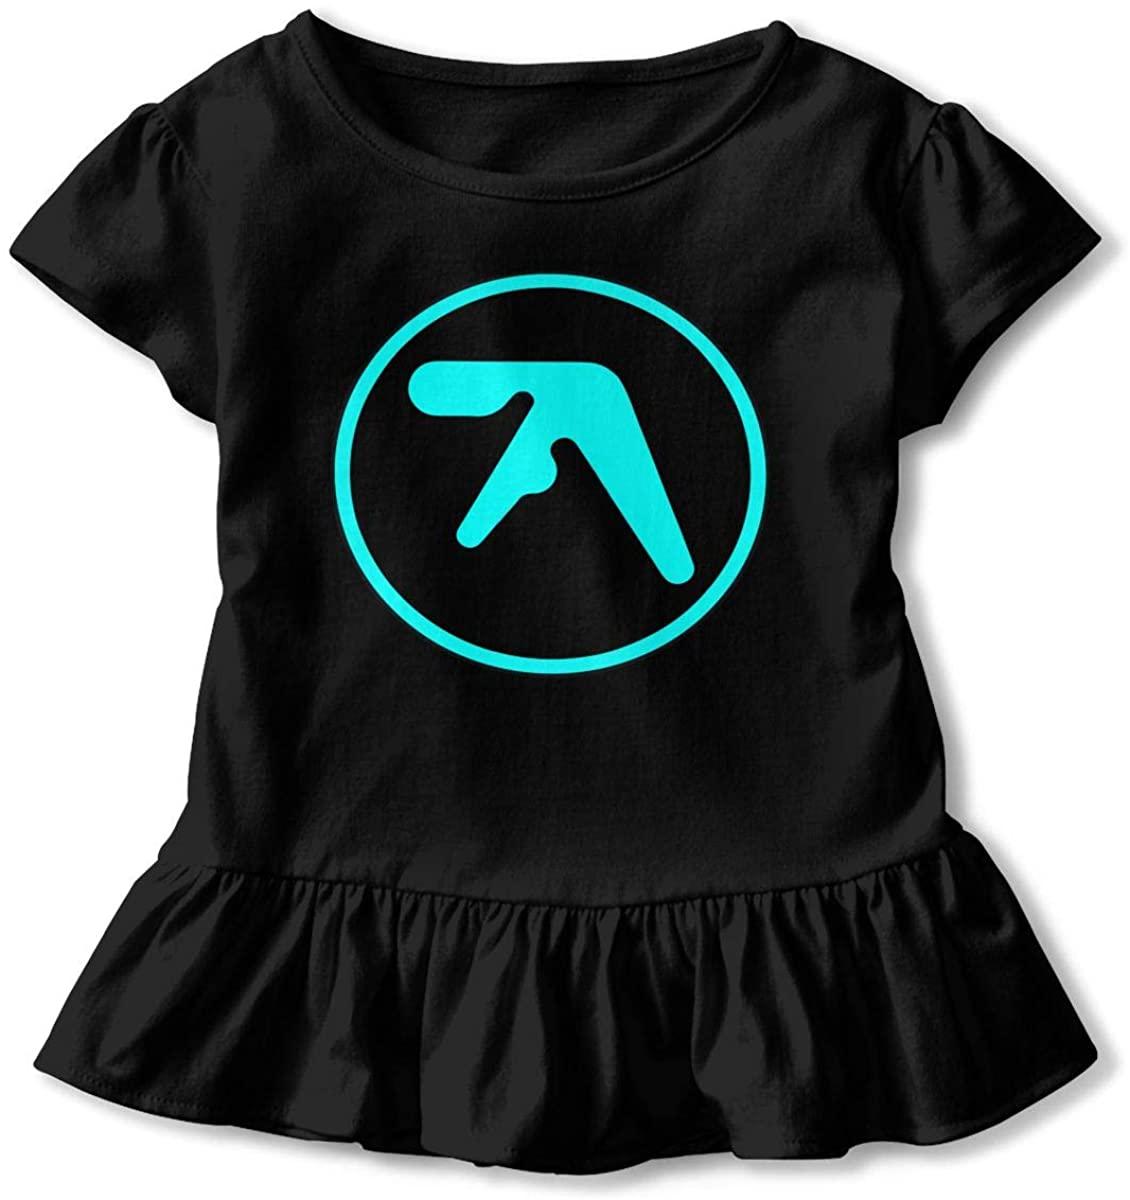 AHUAHUA Kids Aphex Twin Logo Toddler Short Sleeve T Shirt Children Girls Cotton Graphic Tee Soft Dress (2-6T)